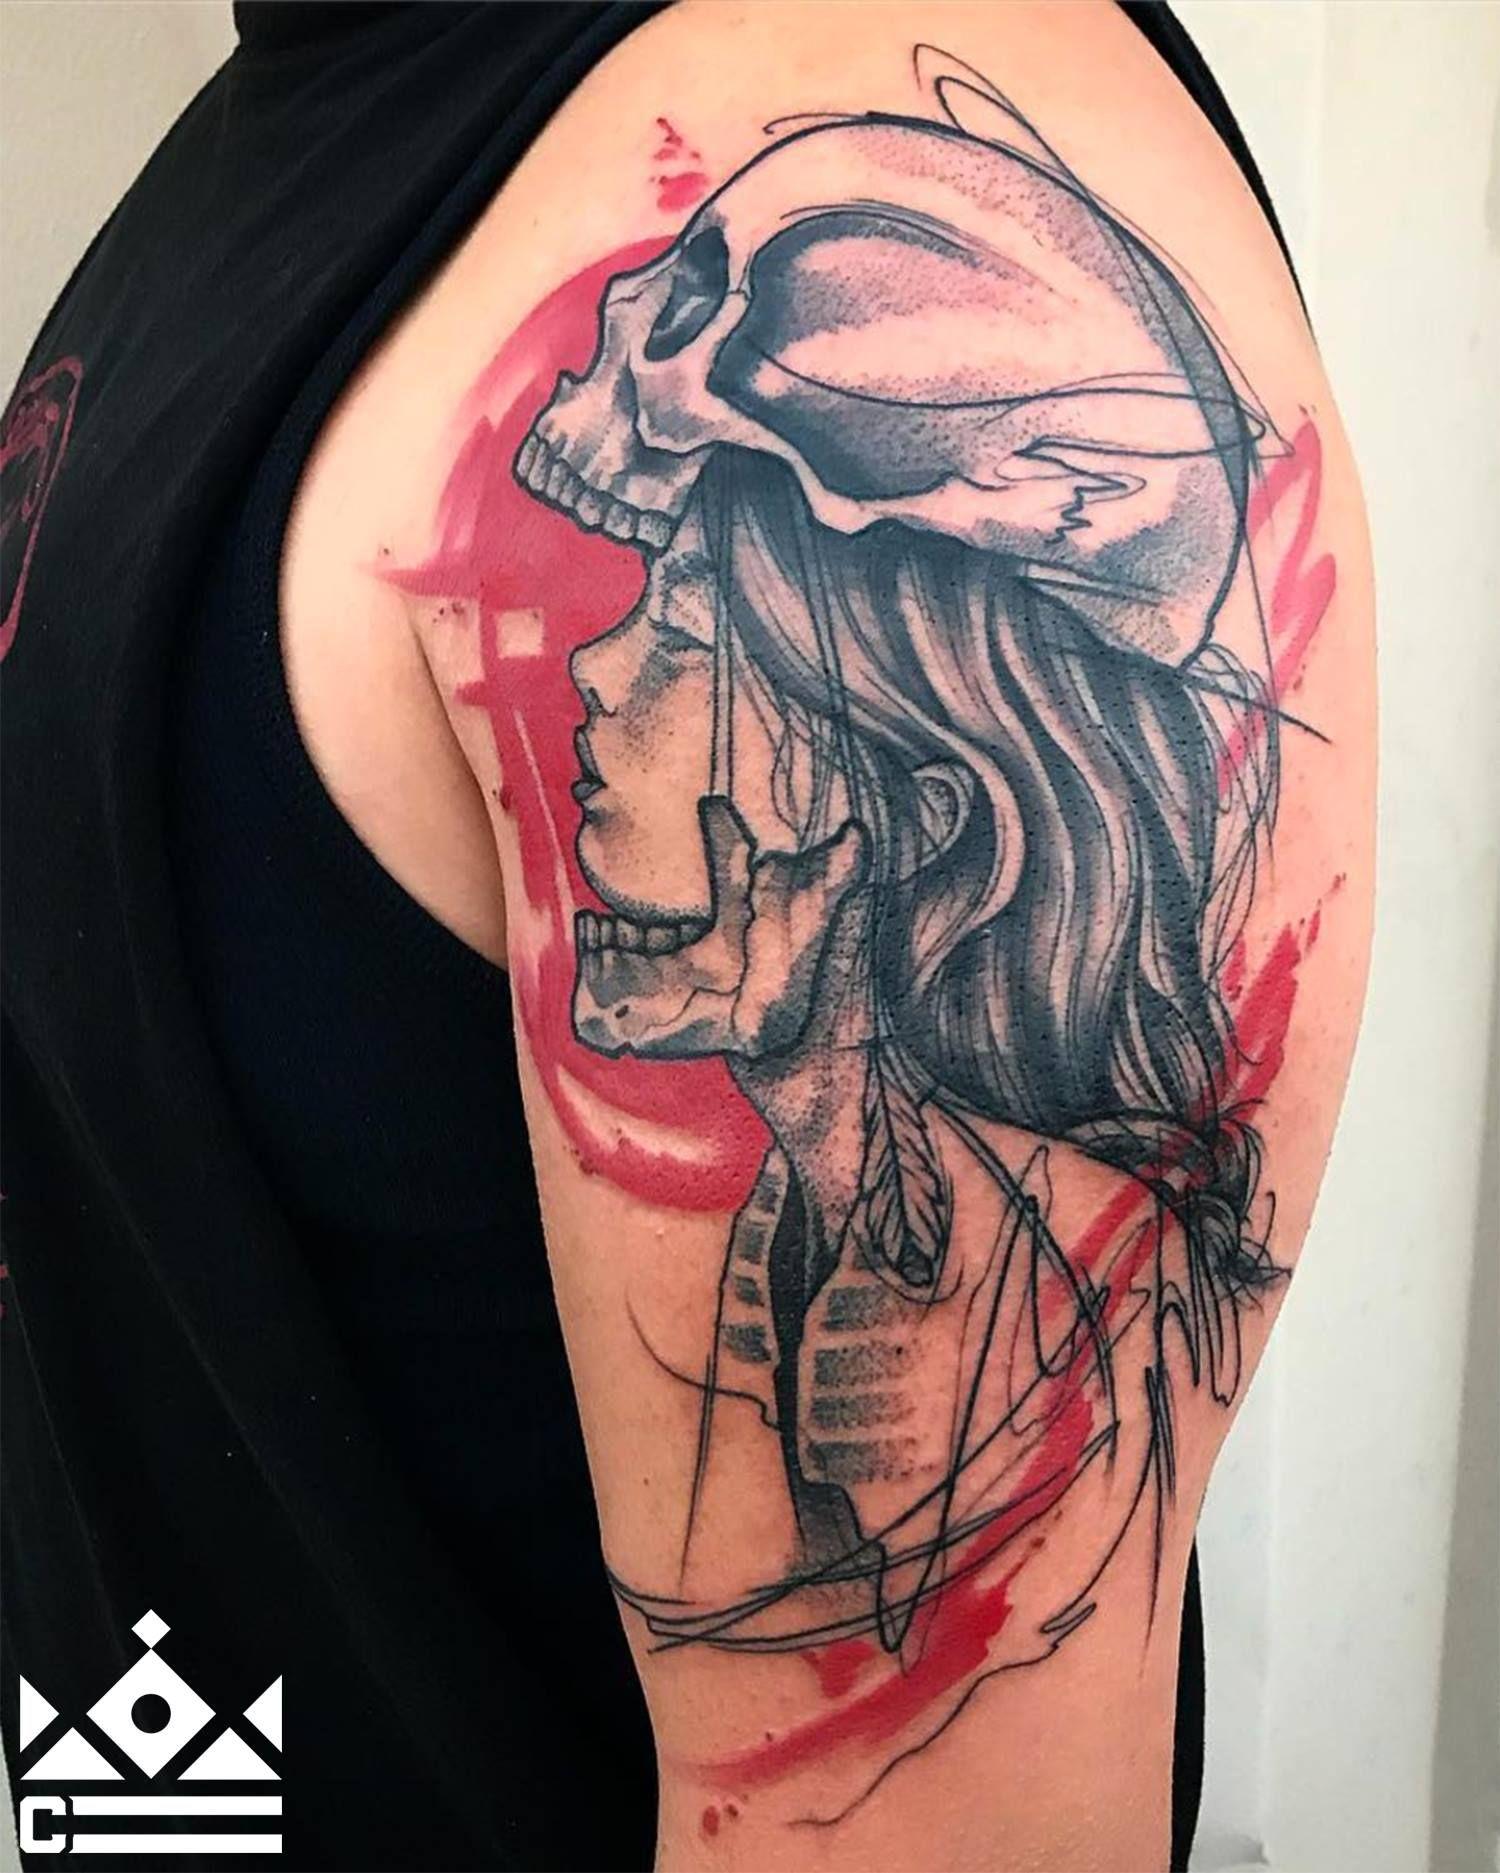 Custom tattoo by skyler espinoza at certified tattoo